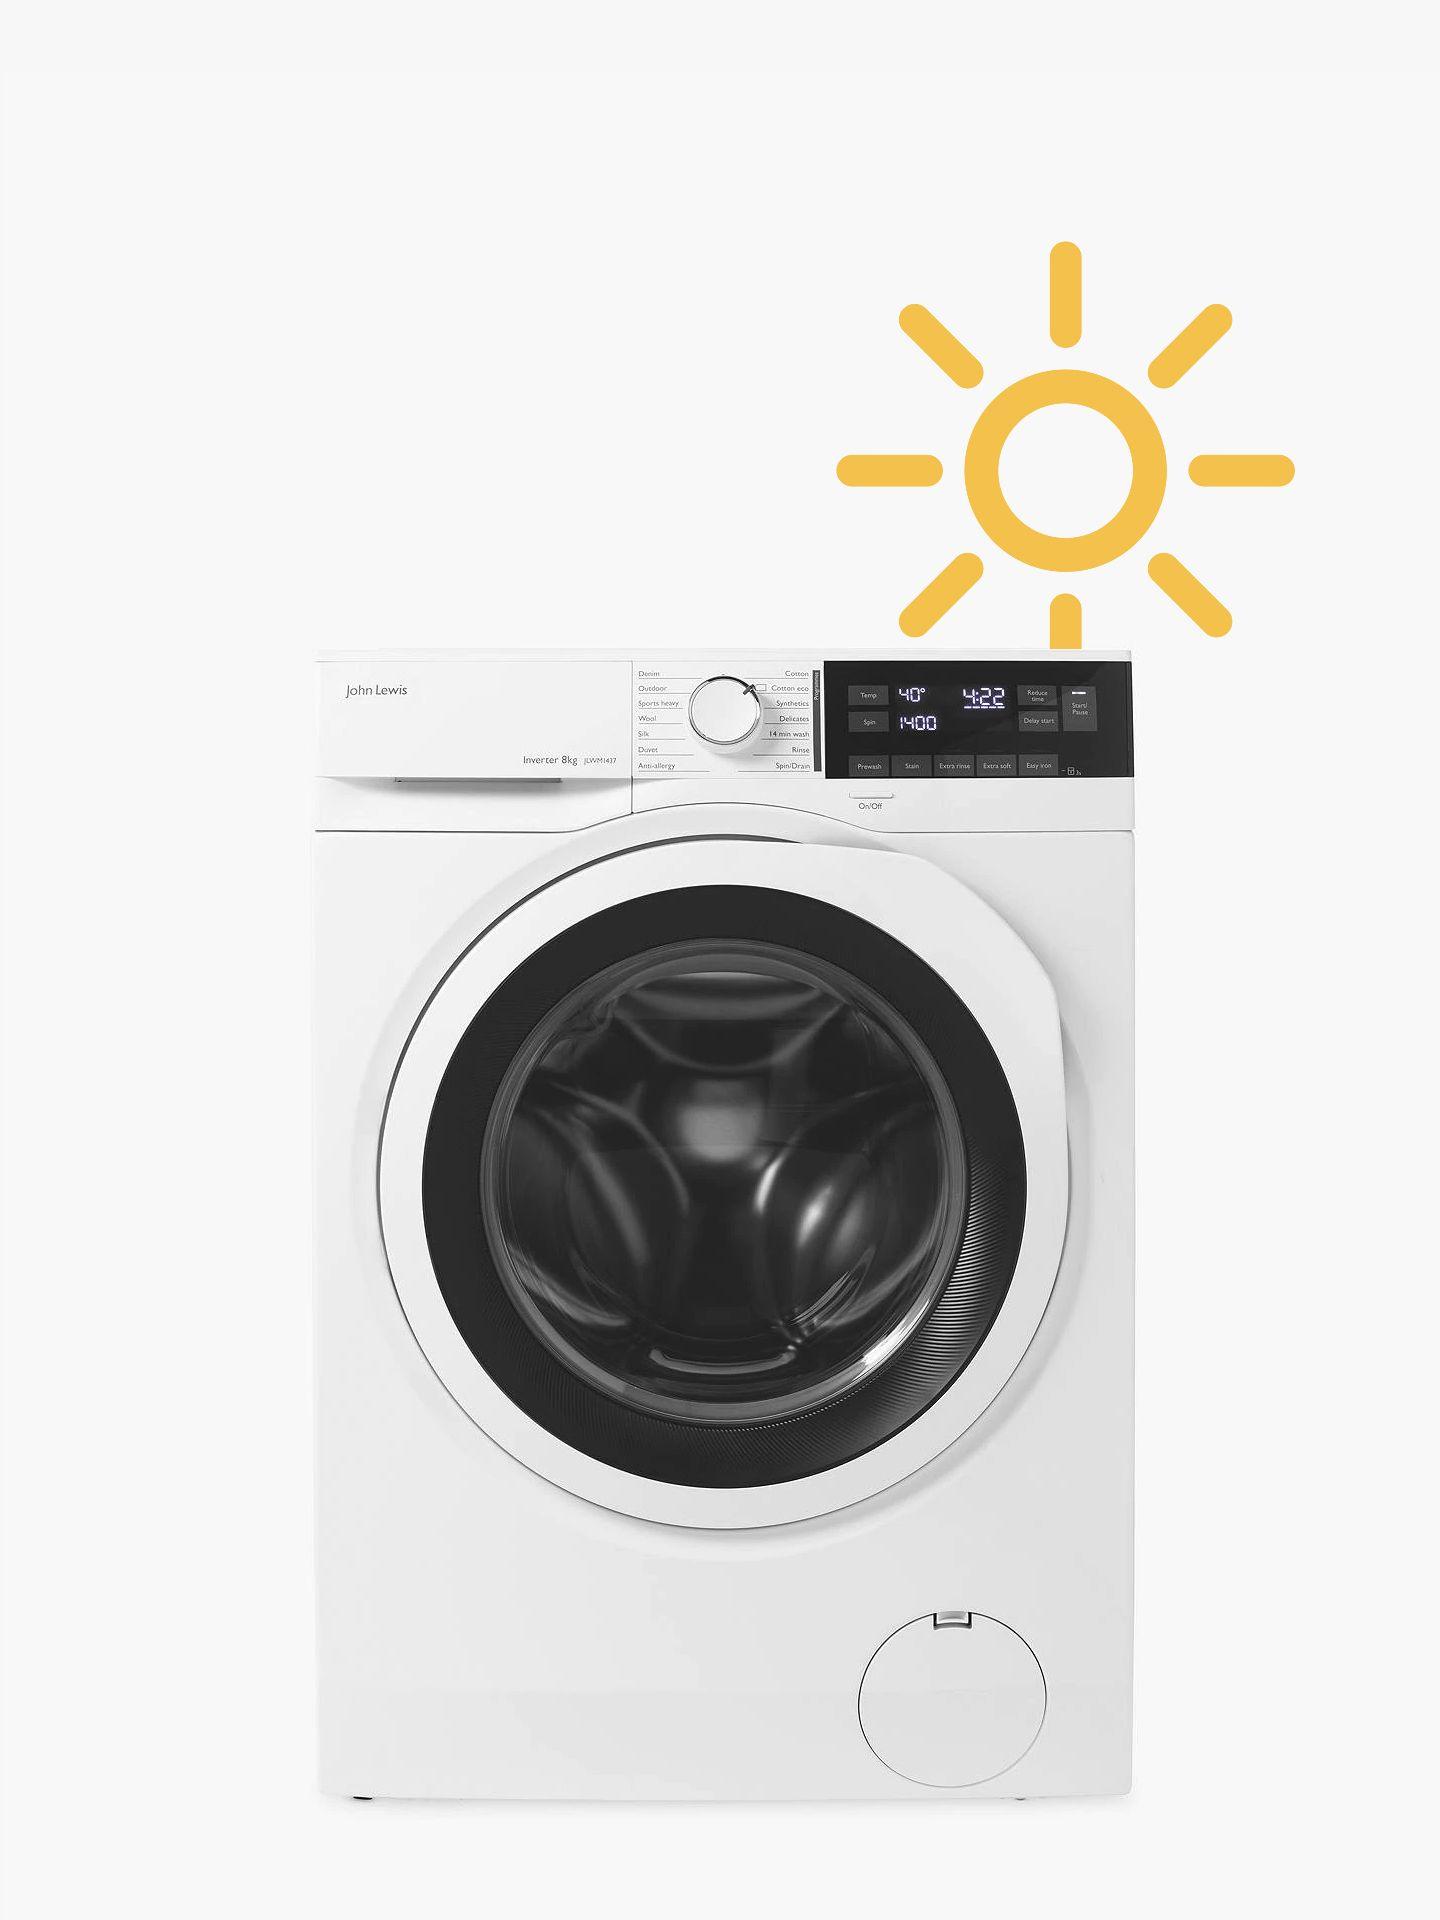 John Lewis & Partners washing machine with sun icon